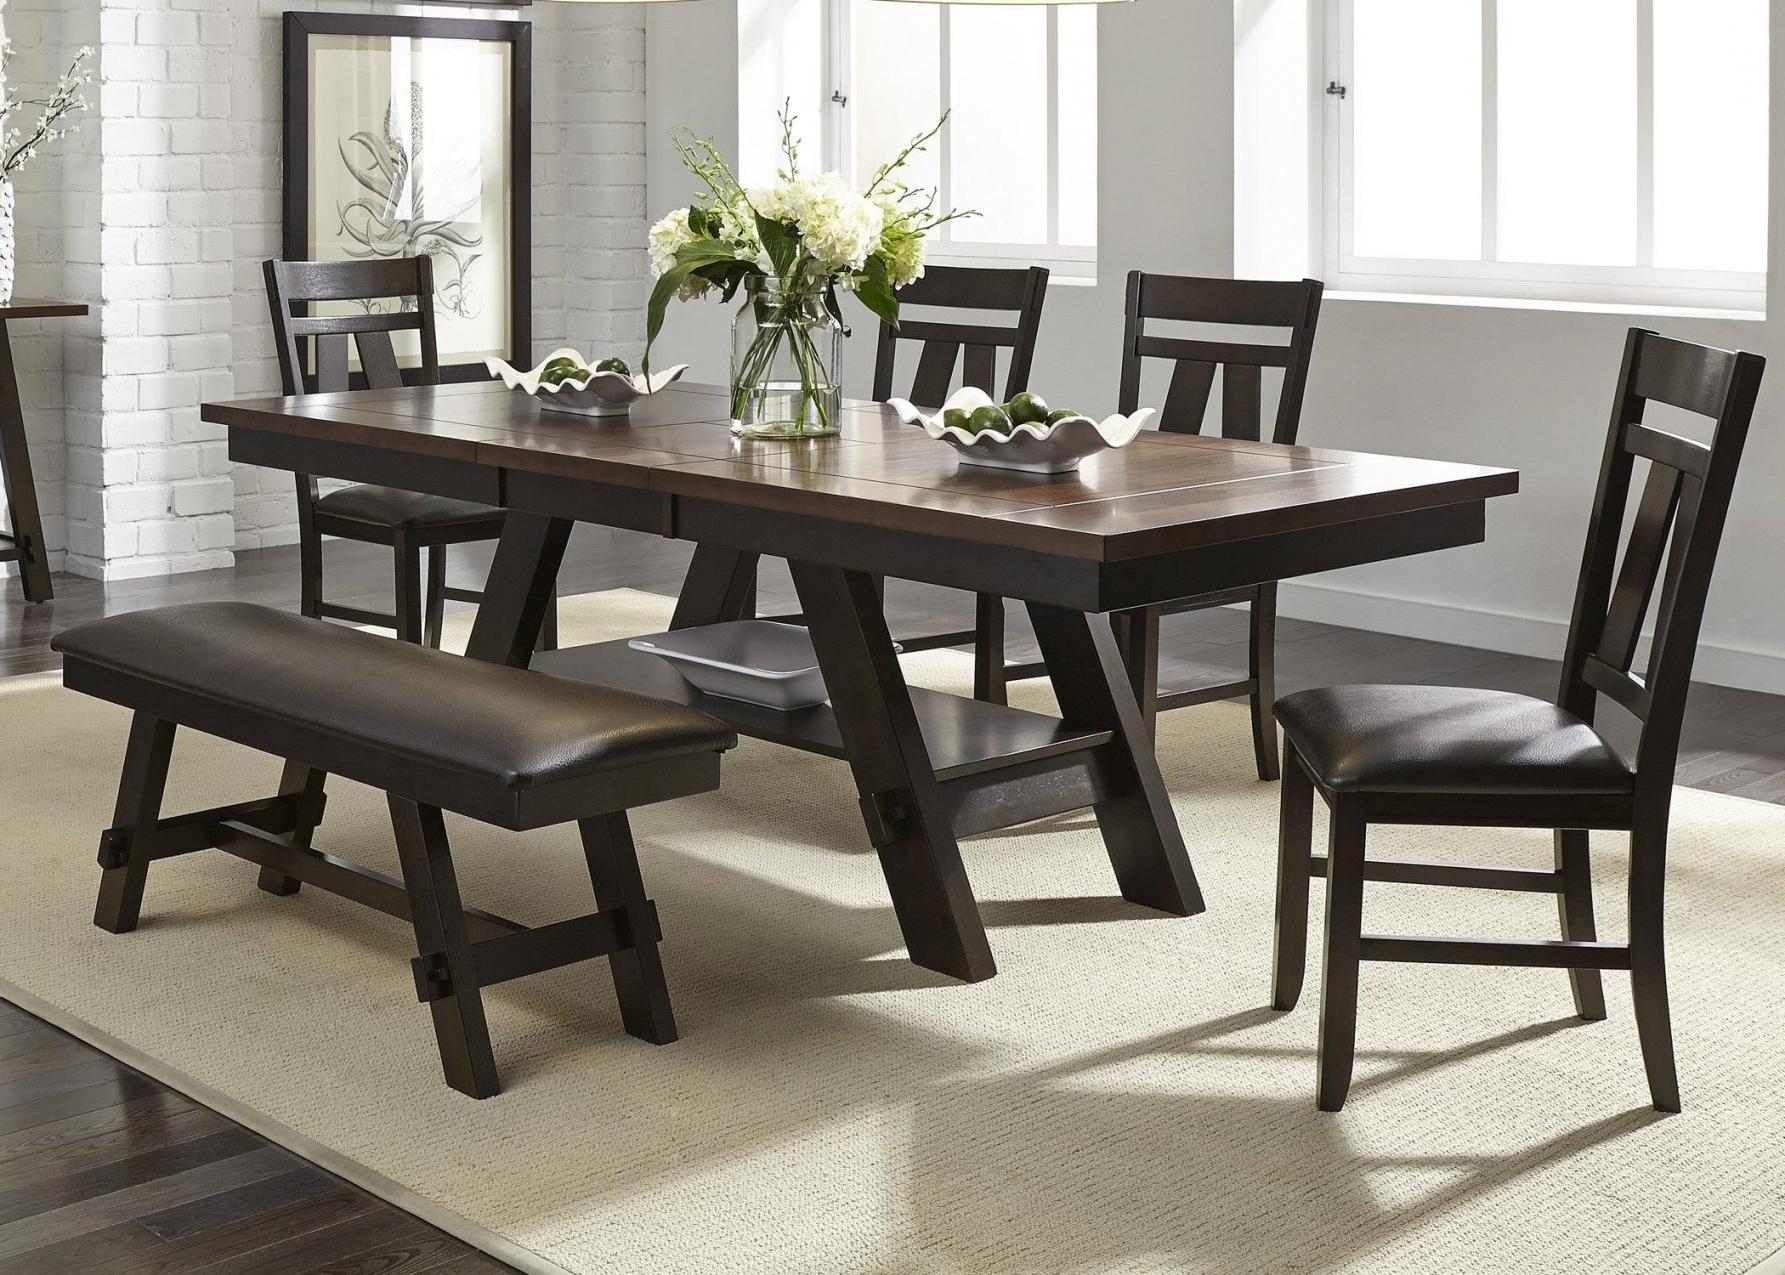 Preferred Partridge 7 Piece Dining Sets Regarding 6 Piece Dining Table Set – Castrophotos (View 20 of 25)